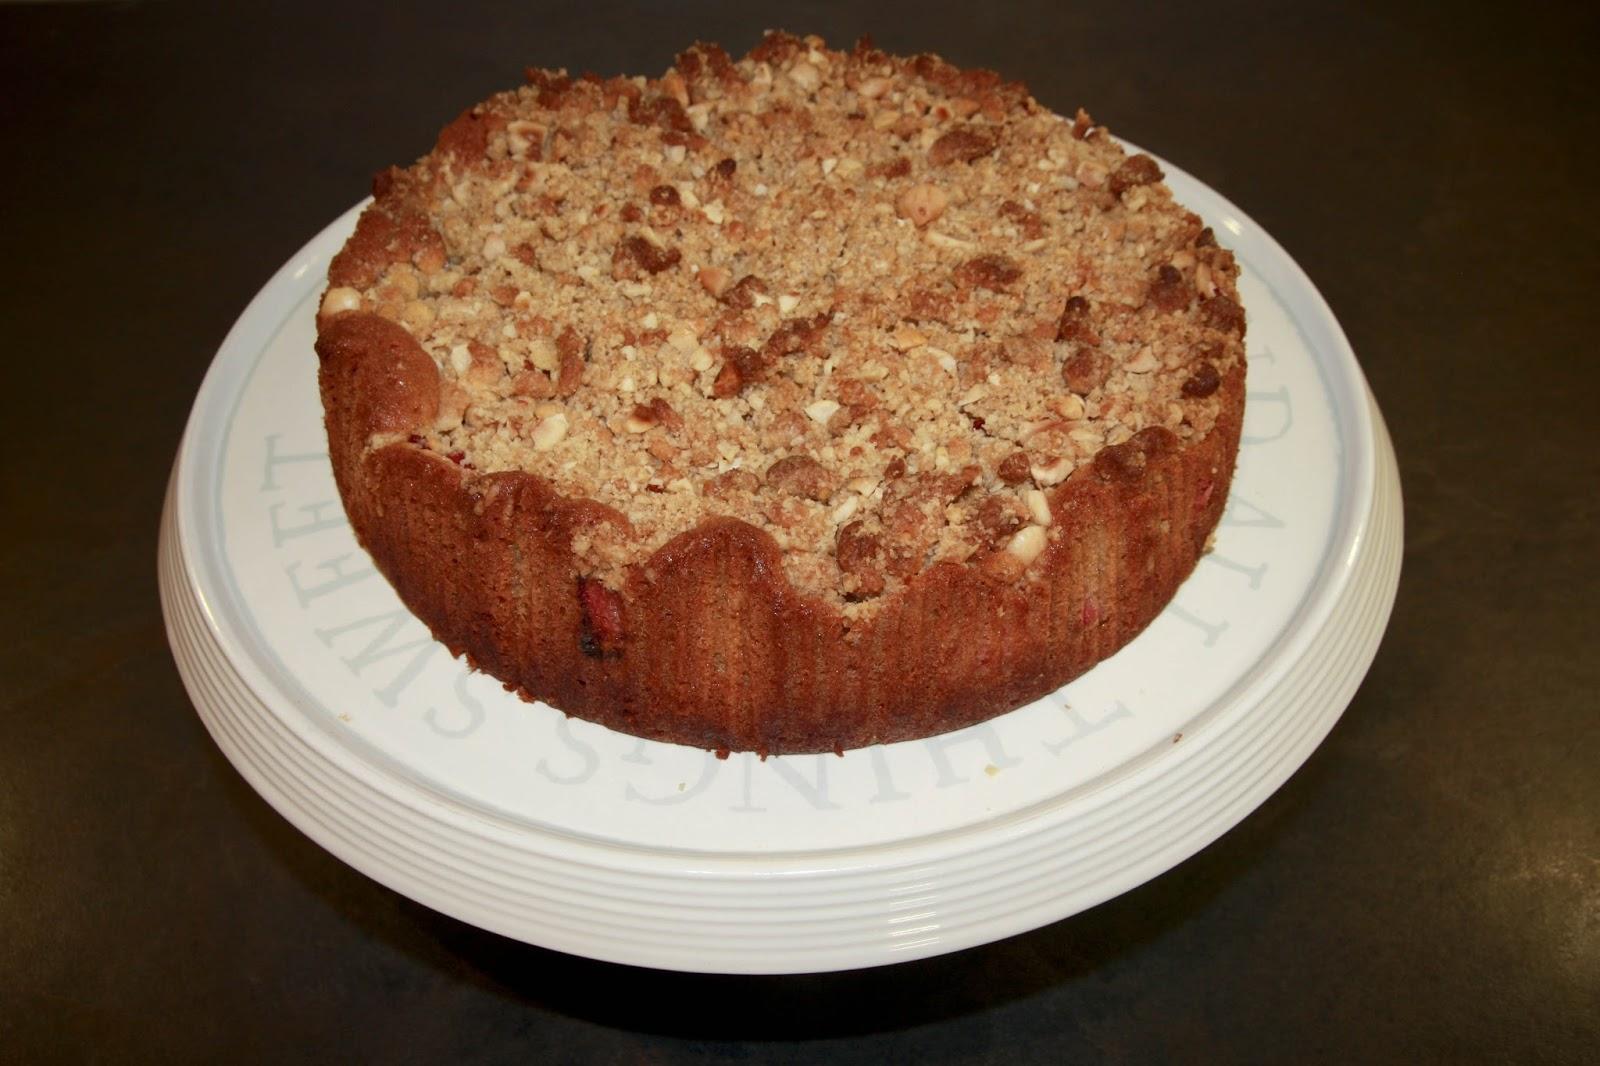 The Cake Trail: Rhubarb and marzipan crumble cake